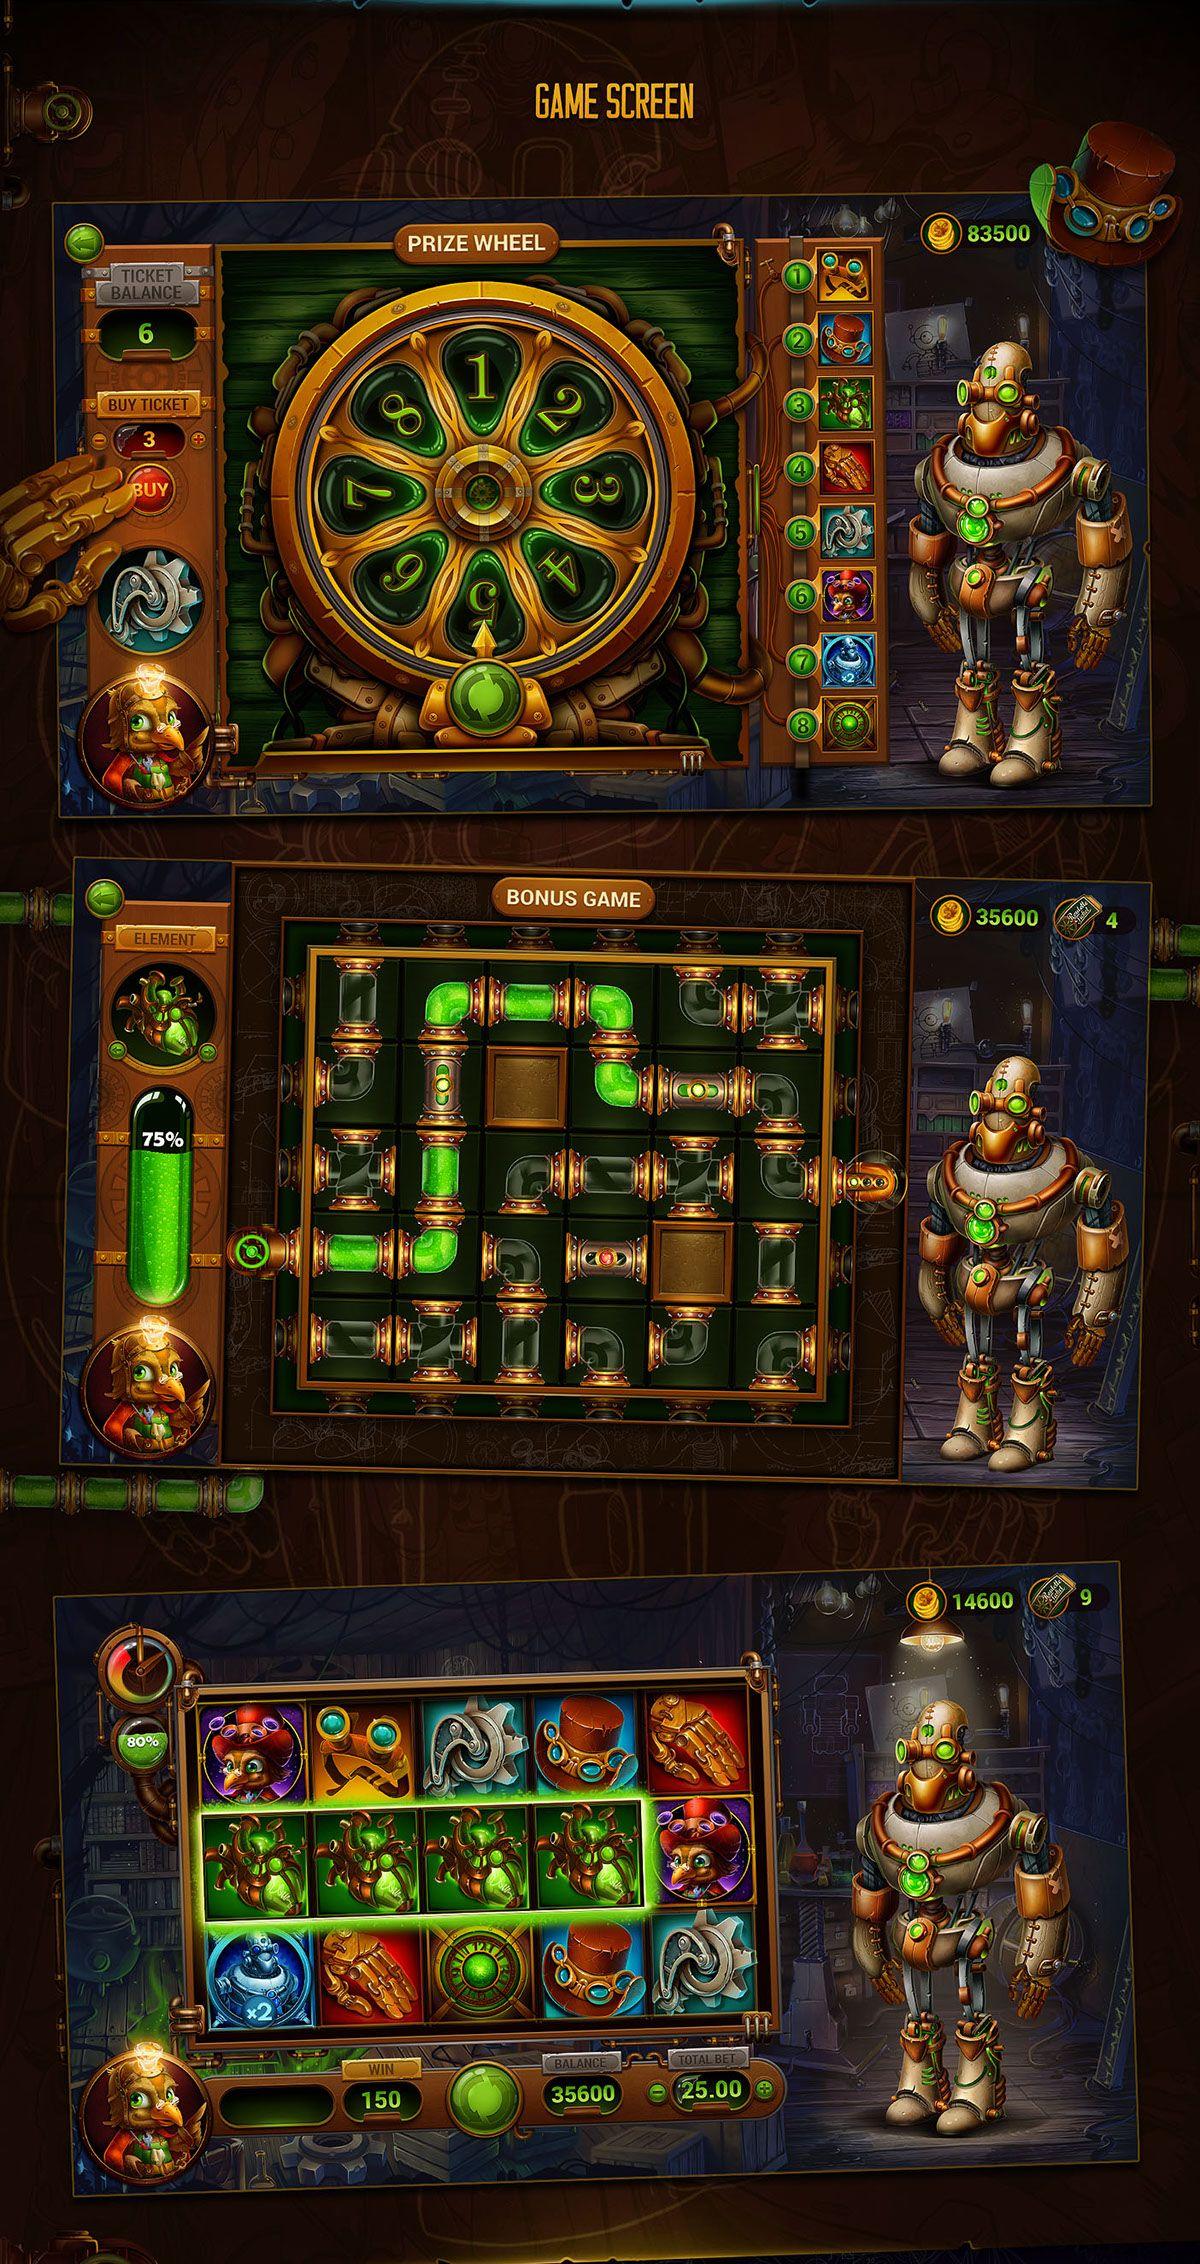 Twist the Gear on Behance | Game : casino | Casino slot